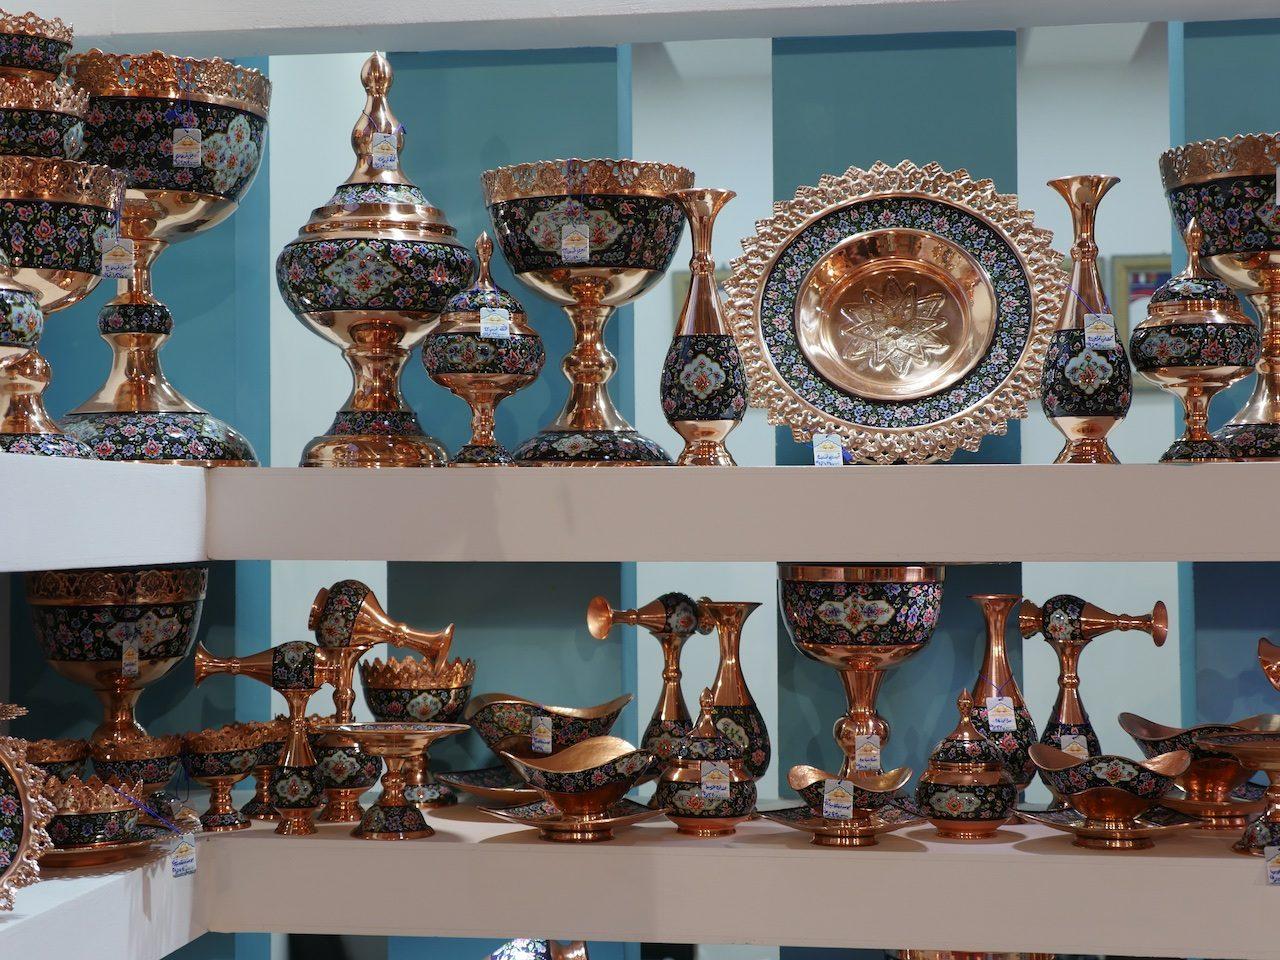 Qalamzani at the Handcrafts Exhibition